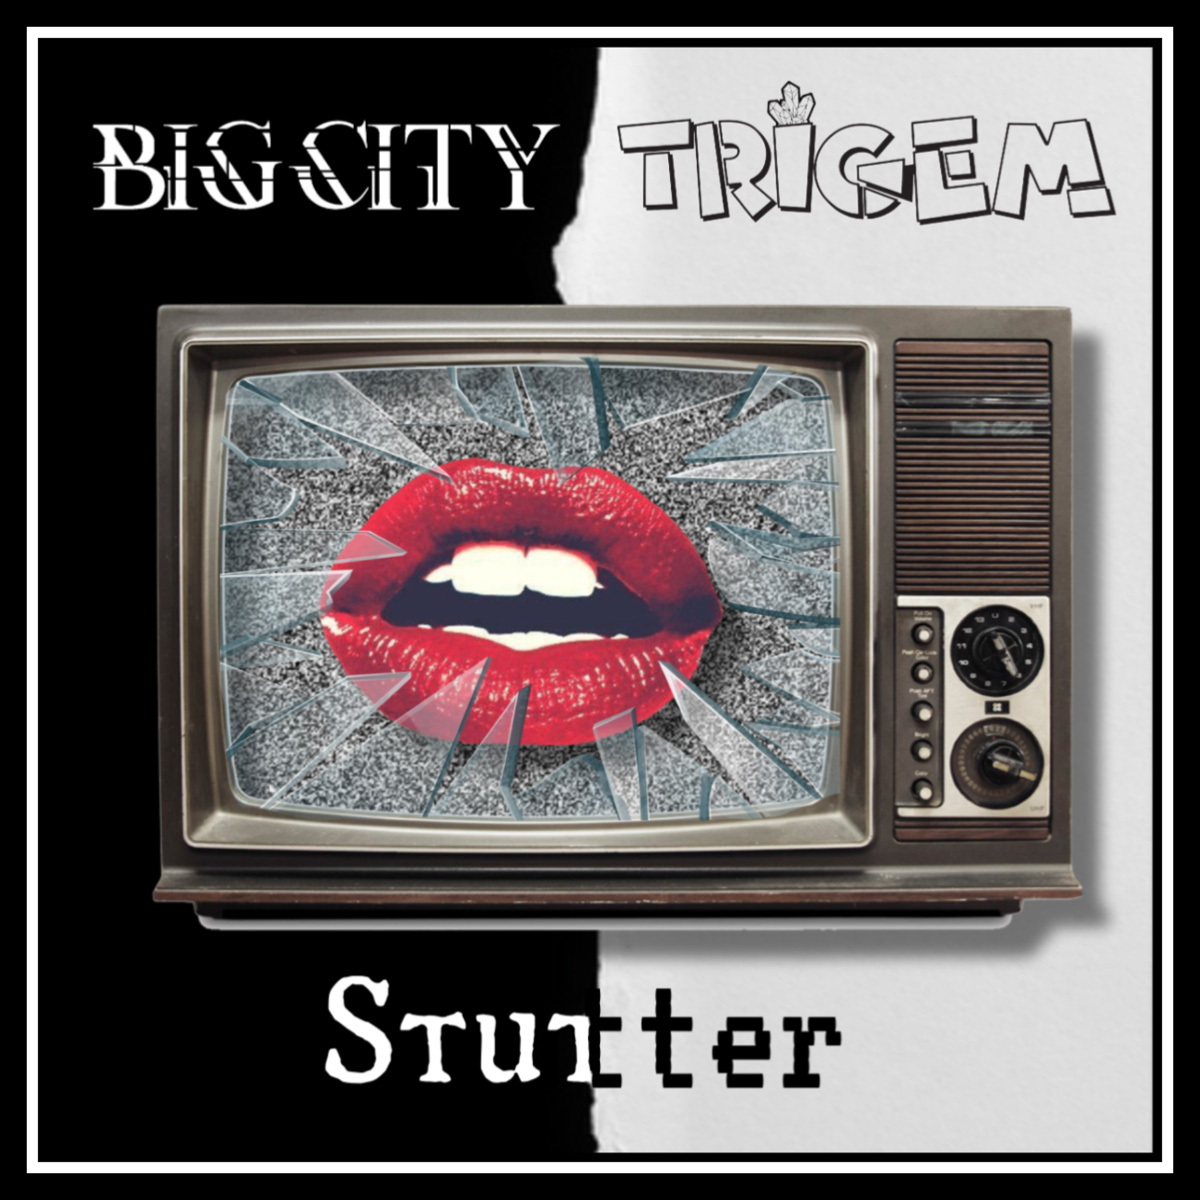 Browser Stutter